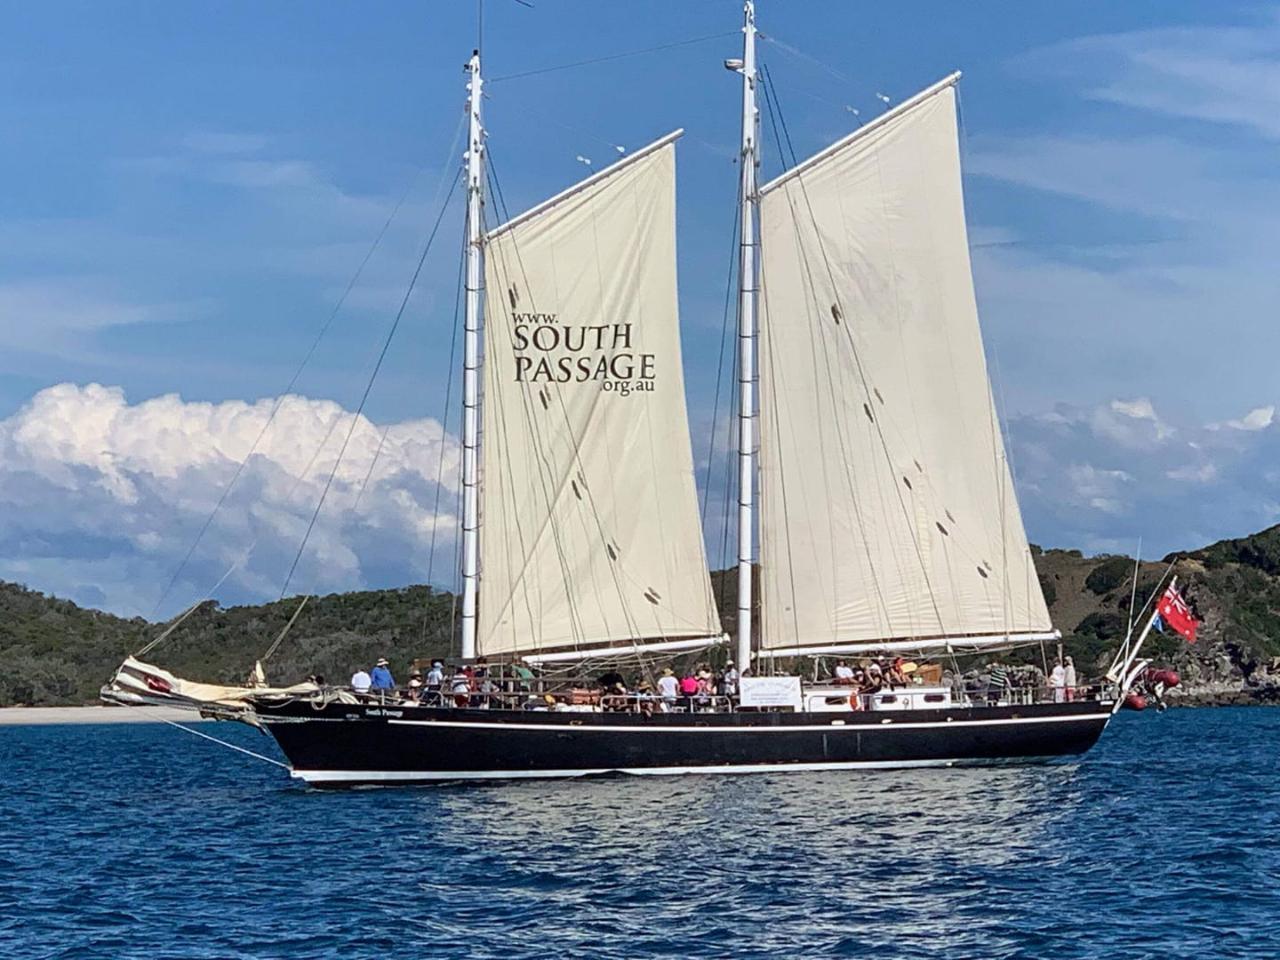 Rosslyn Bay Day Sail  Saturday 22nd May